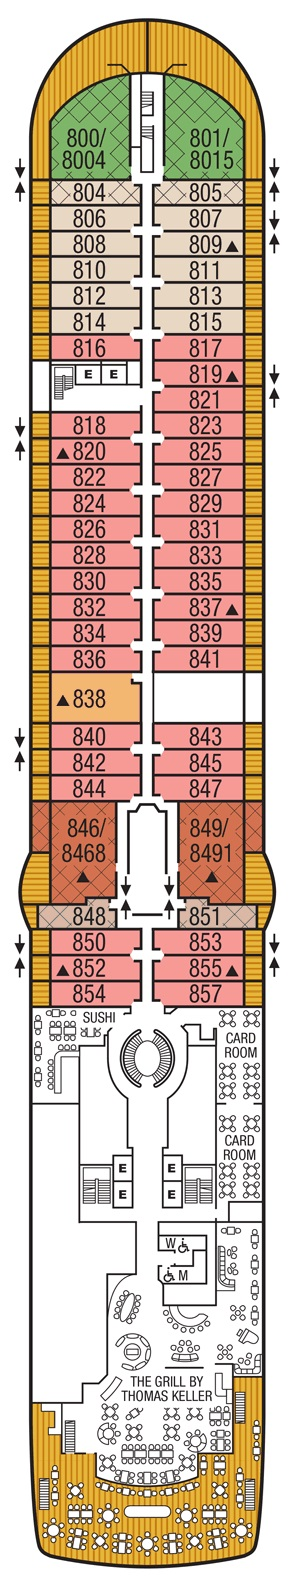 Seabourn Encore - Deck 08